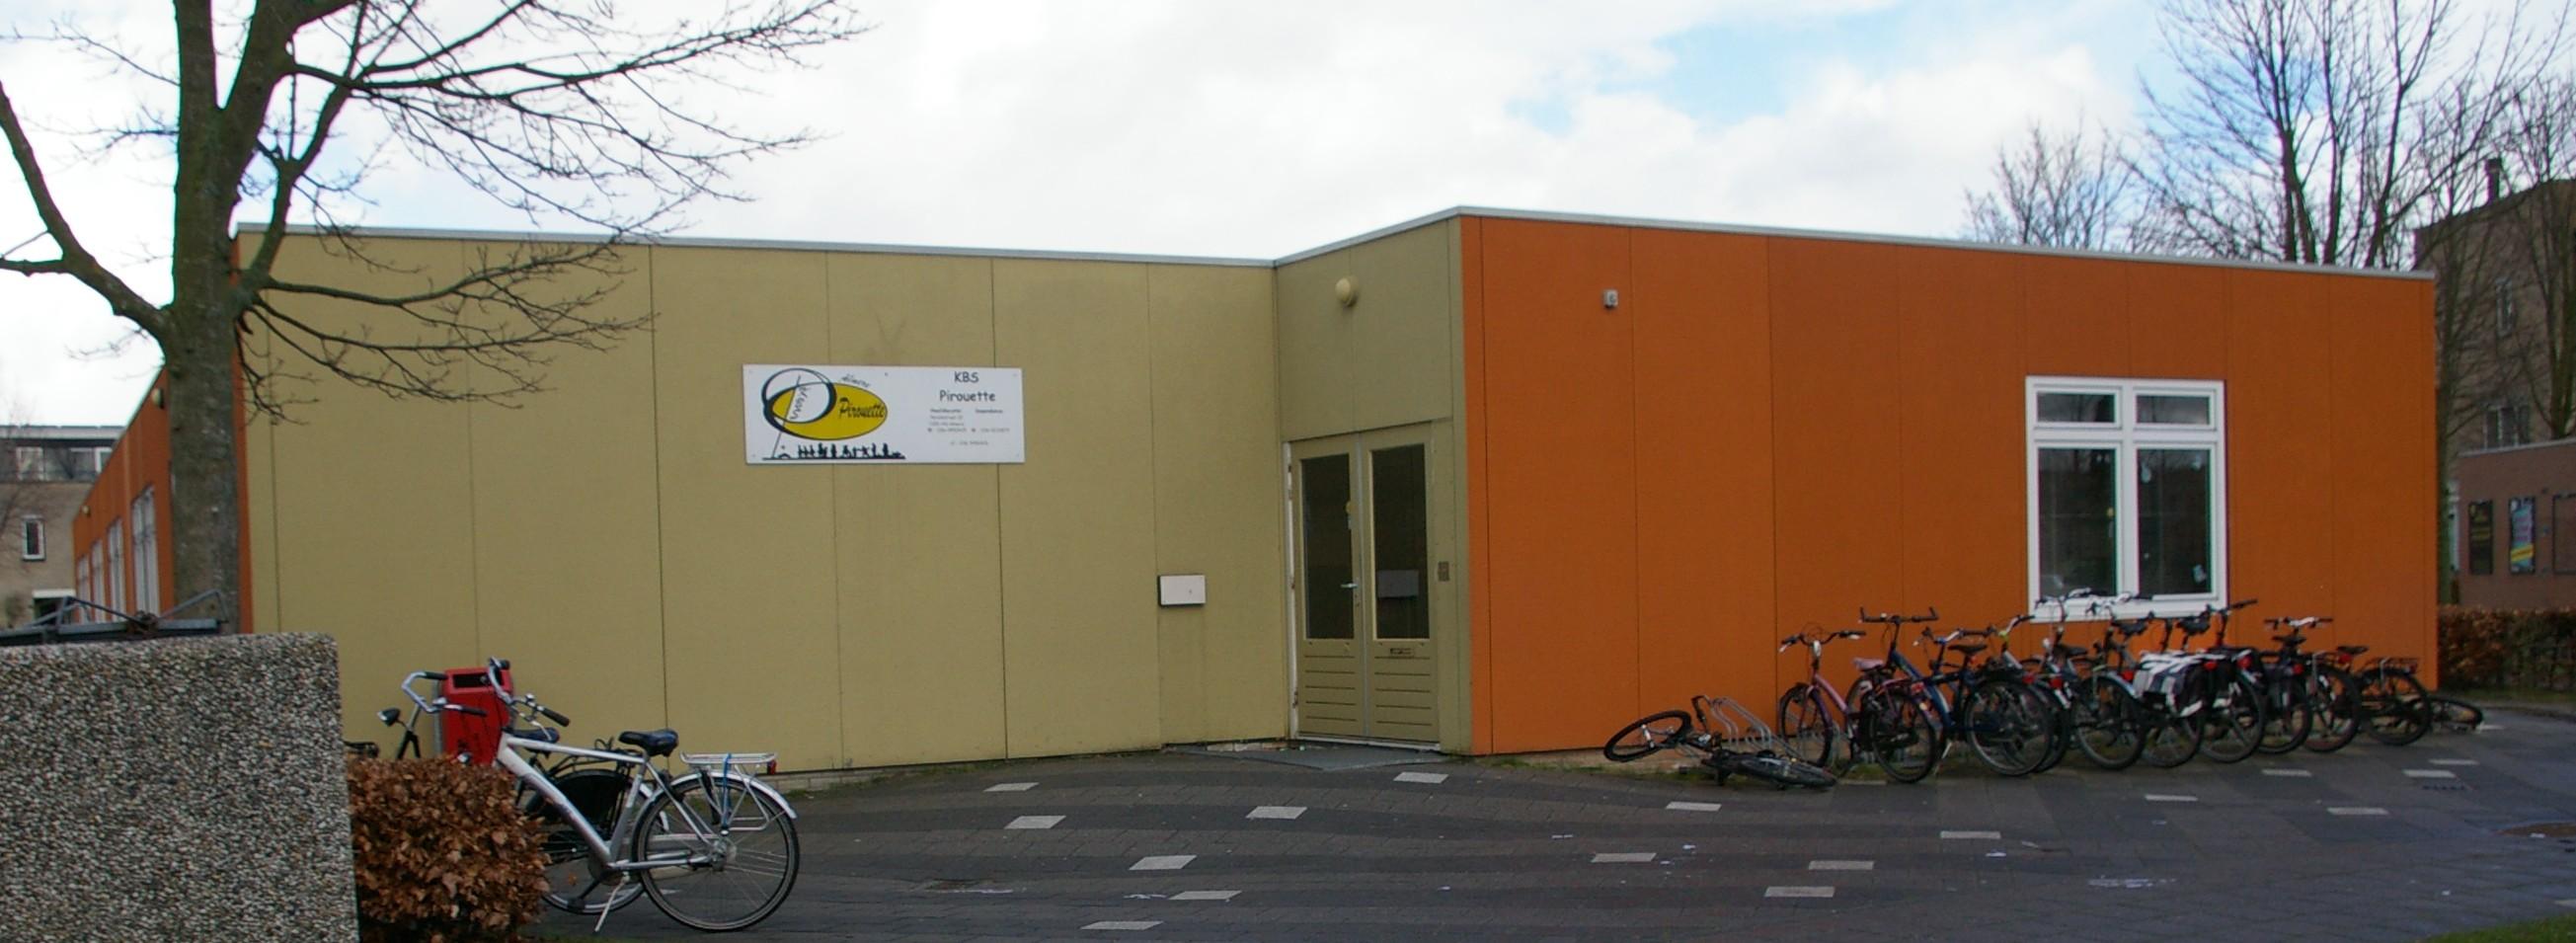 Pirouette yvonne almere gebouw | Rapido Typen